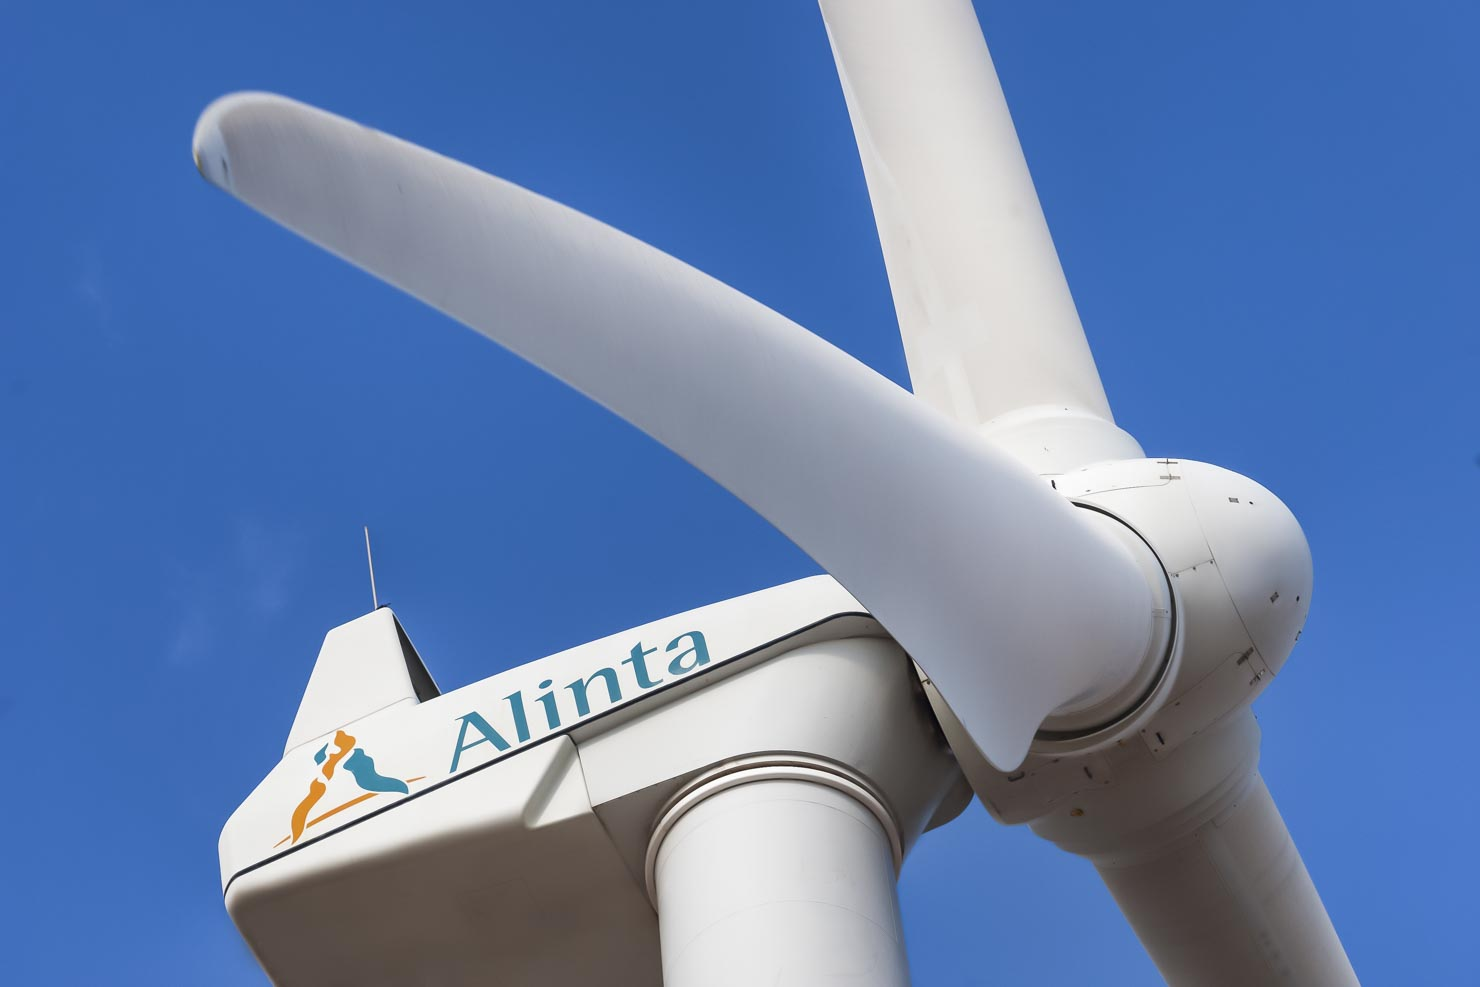 Alinta wind turbine